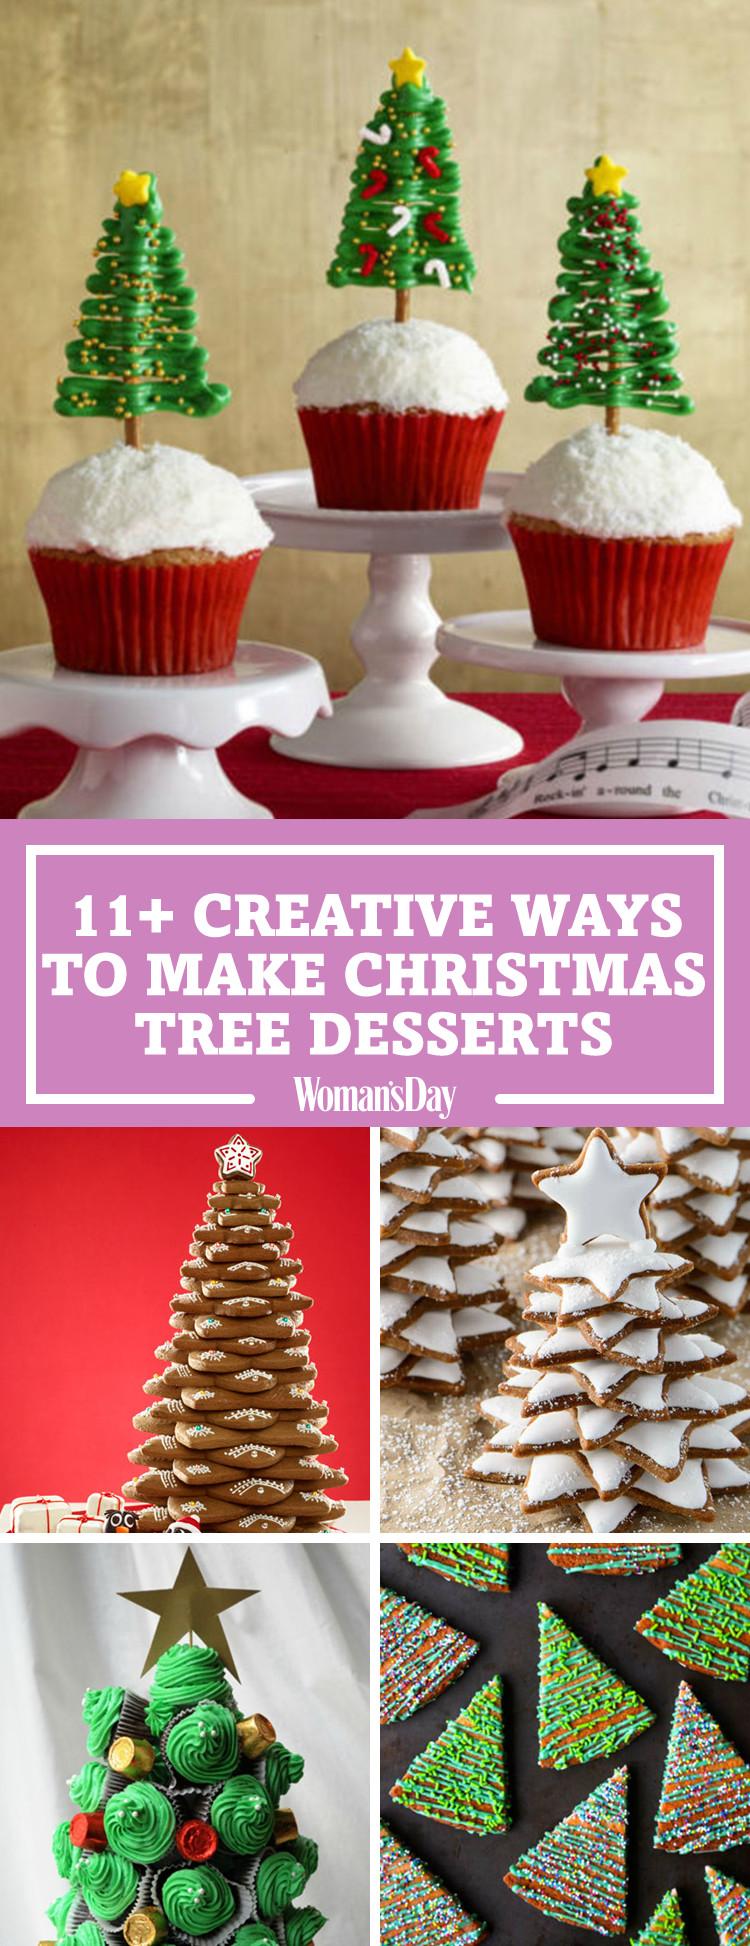 Christmas Tree Desserts  Christmas Tree Desserts The Best Christmas Tree Desserts